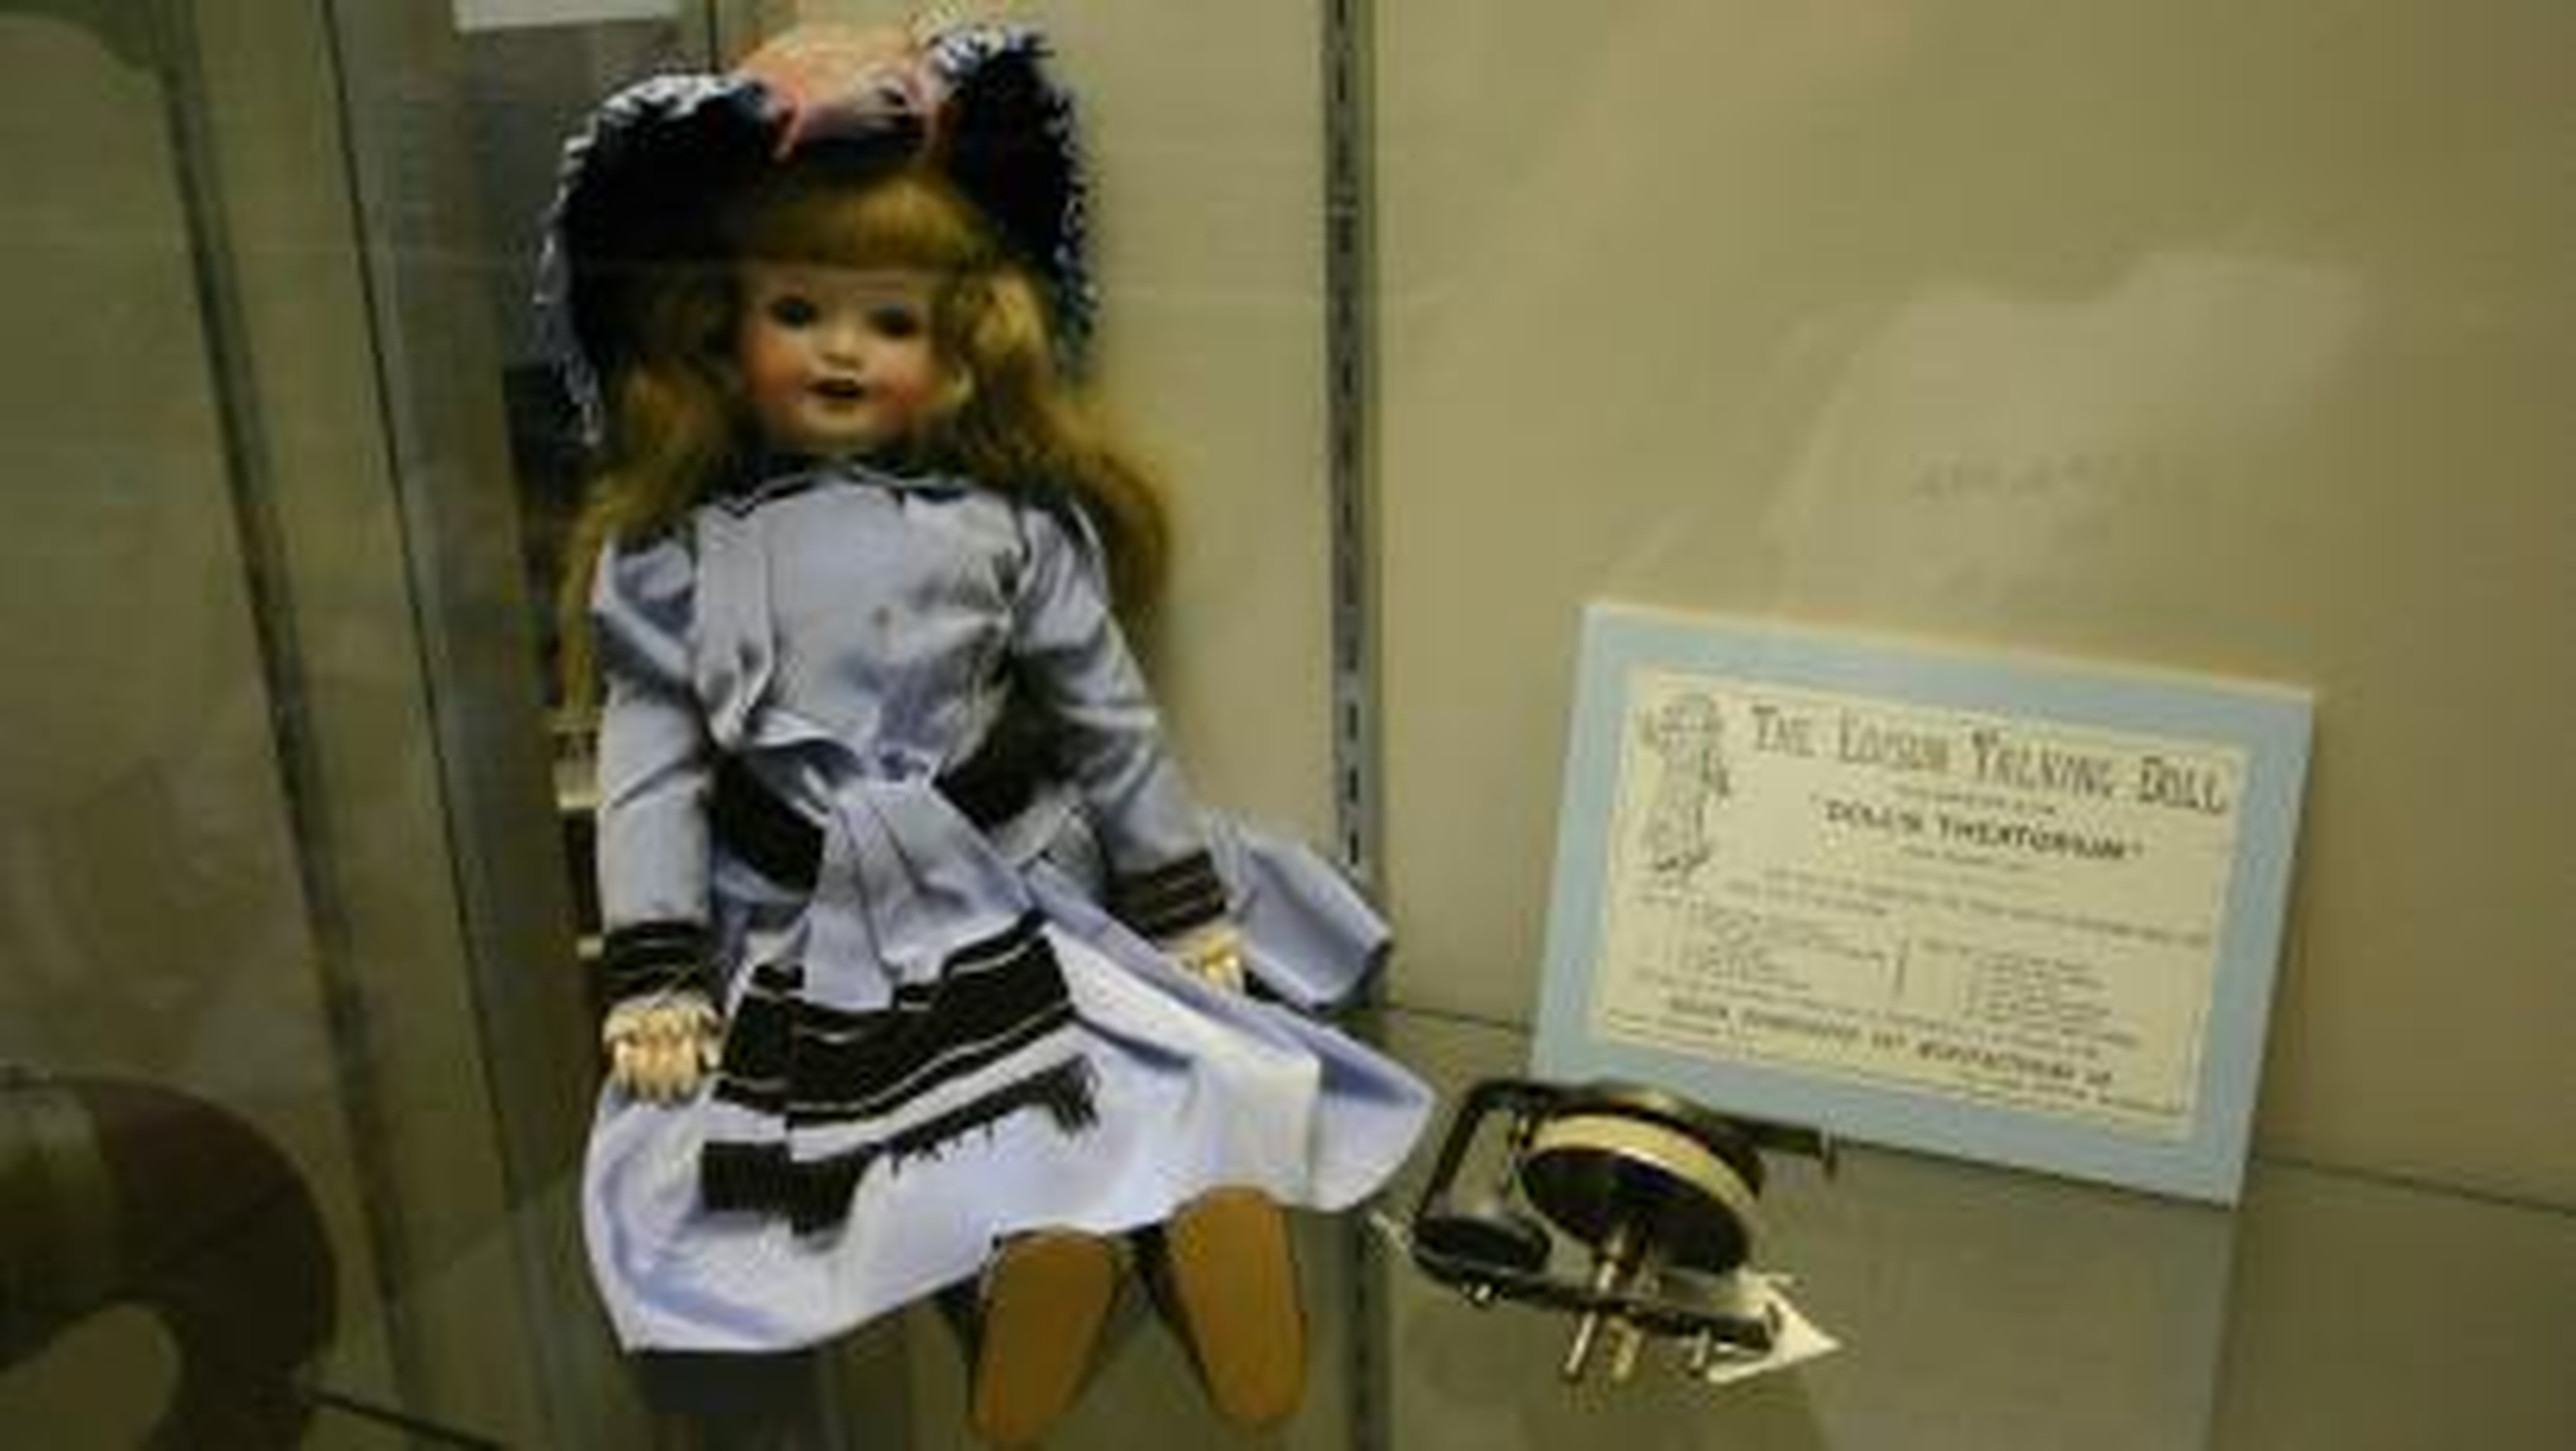 Thomas Edison talking doll